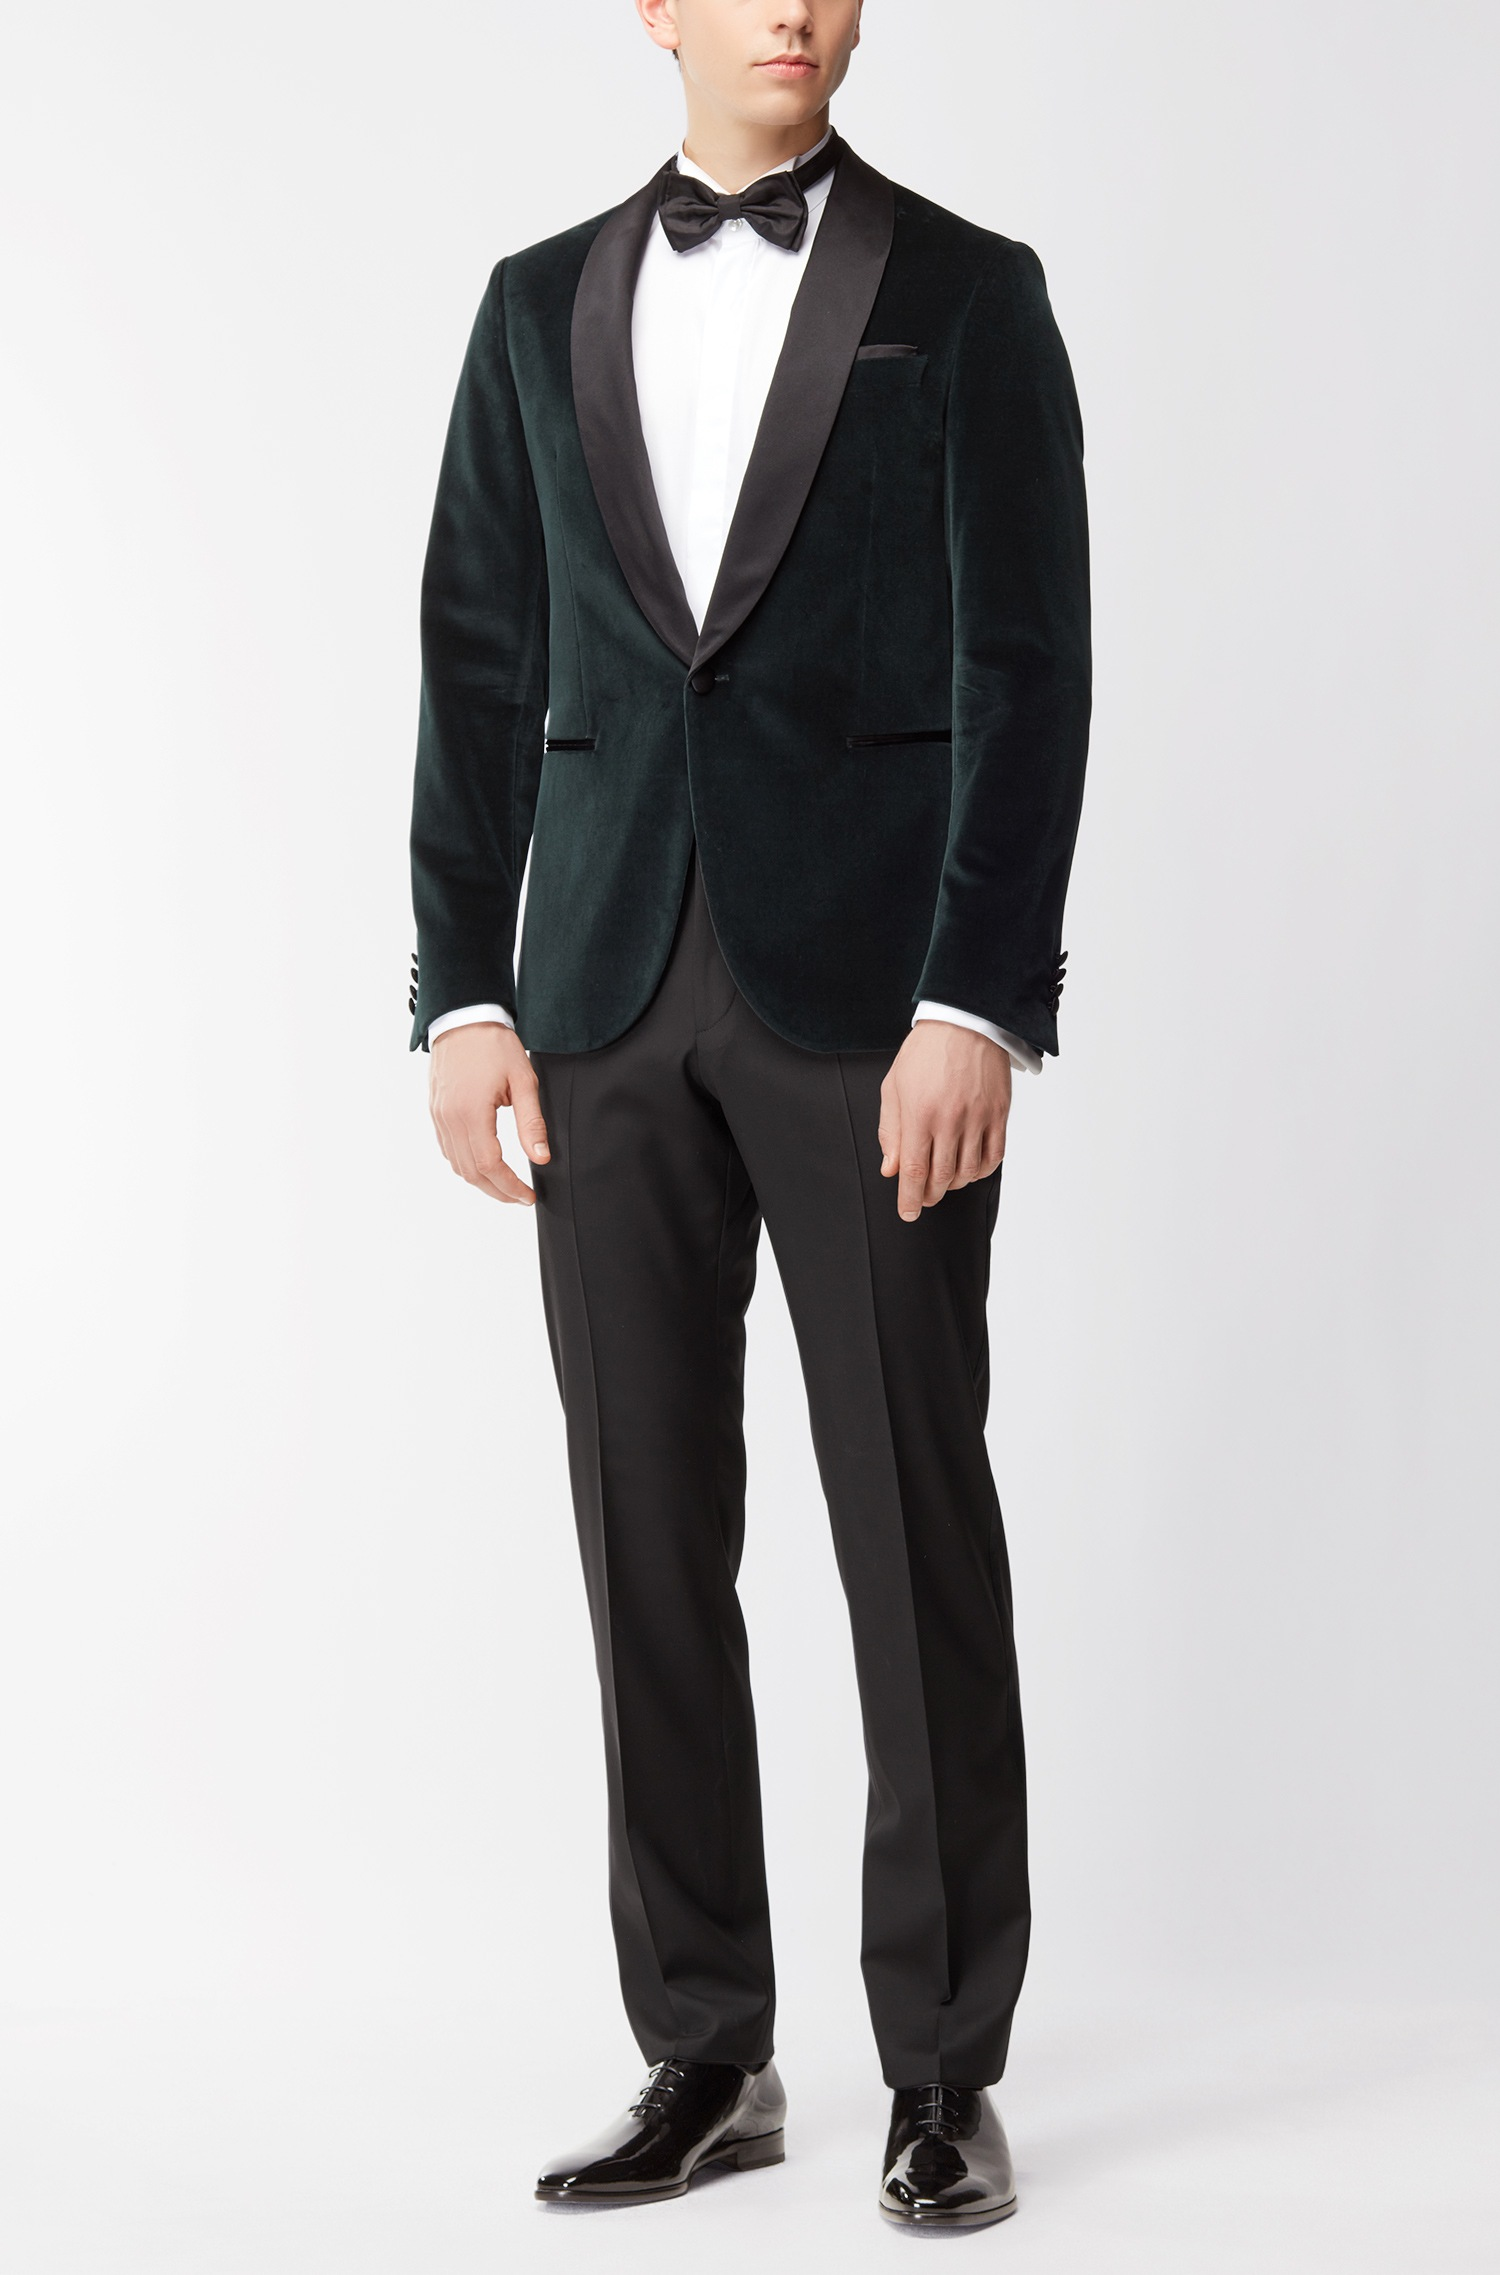 Velvet dinner jacket in a slim fit with silk lapels